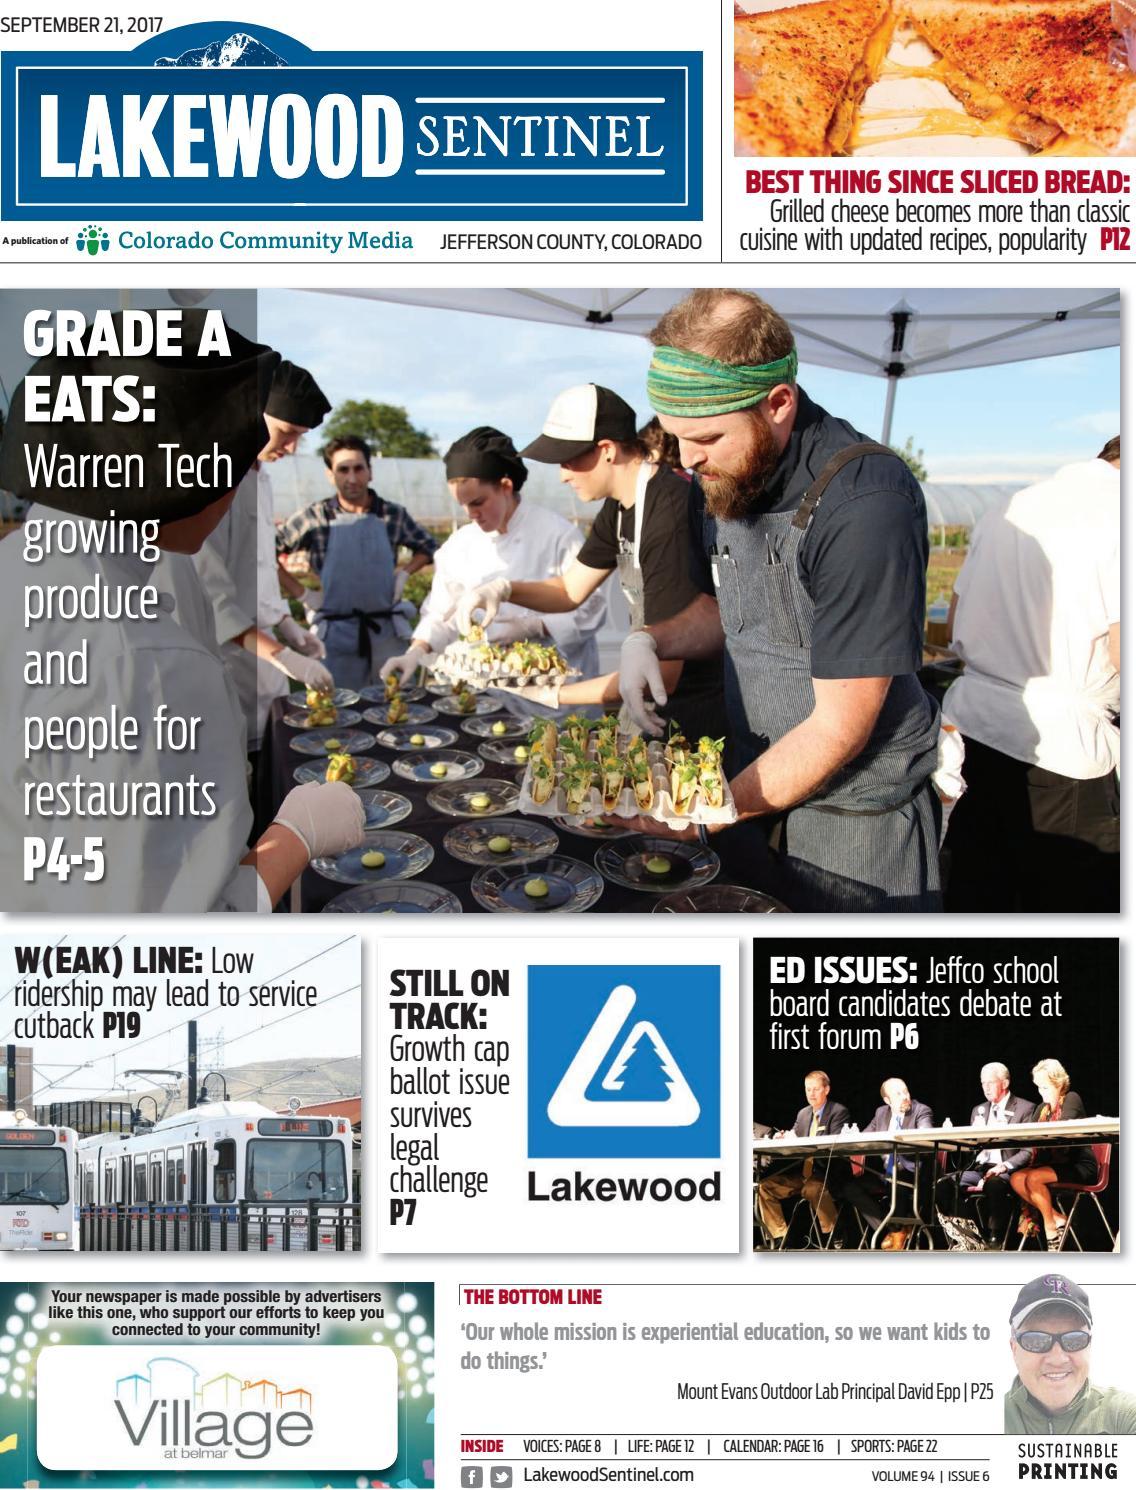 lakewood sentinel 0921 by colorado community media issuu